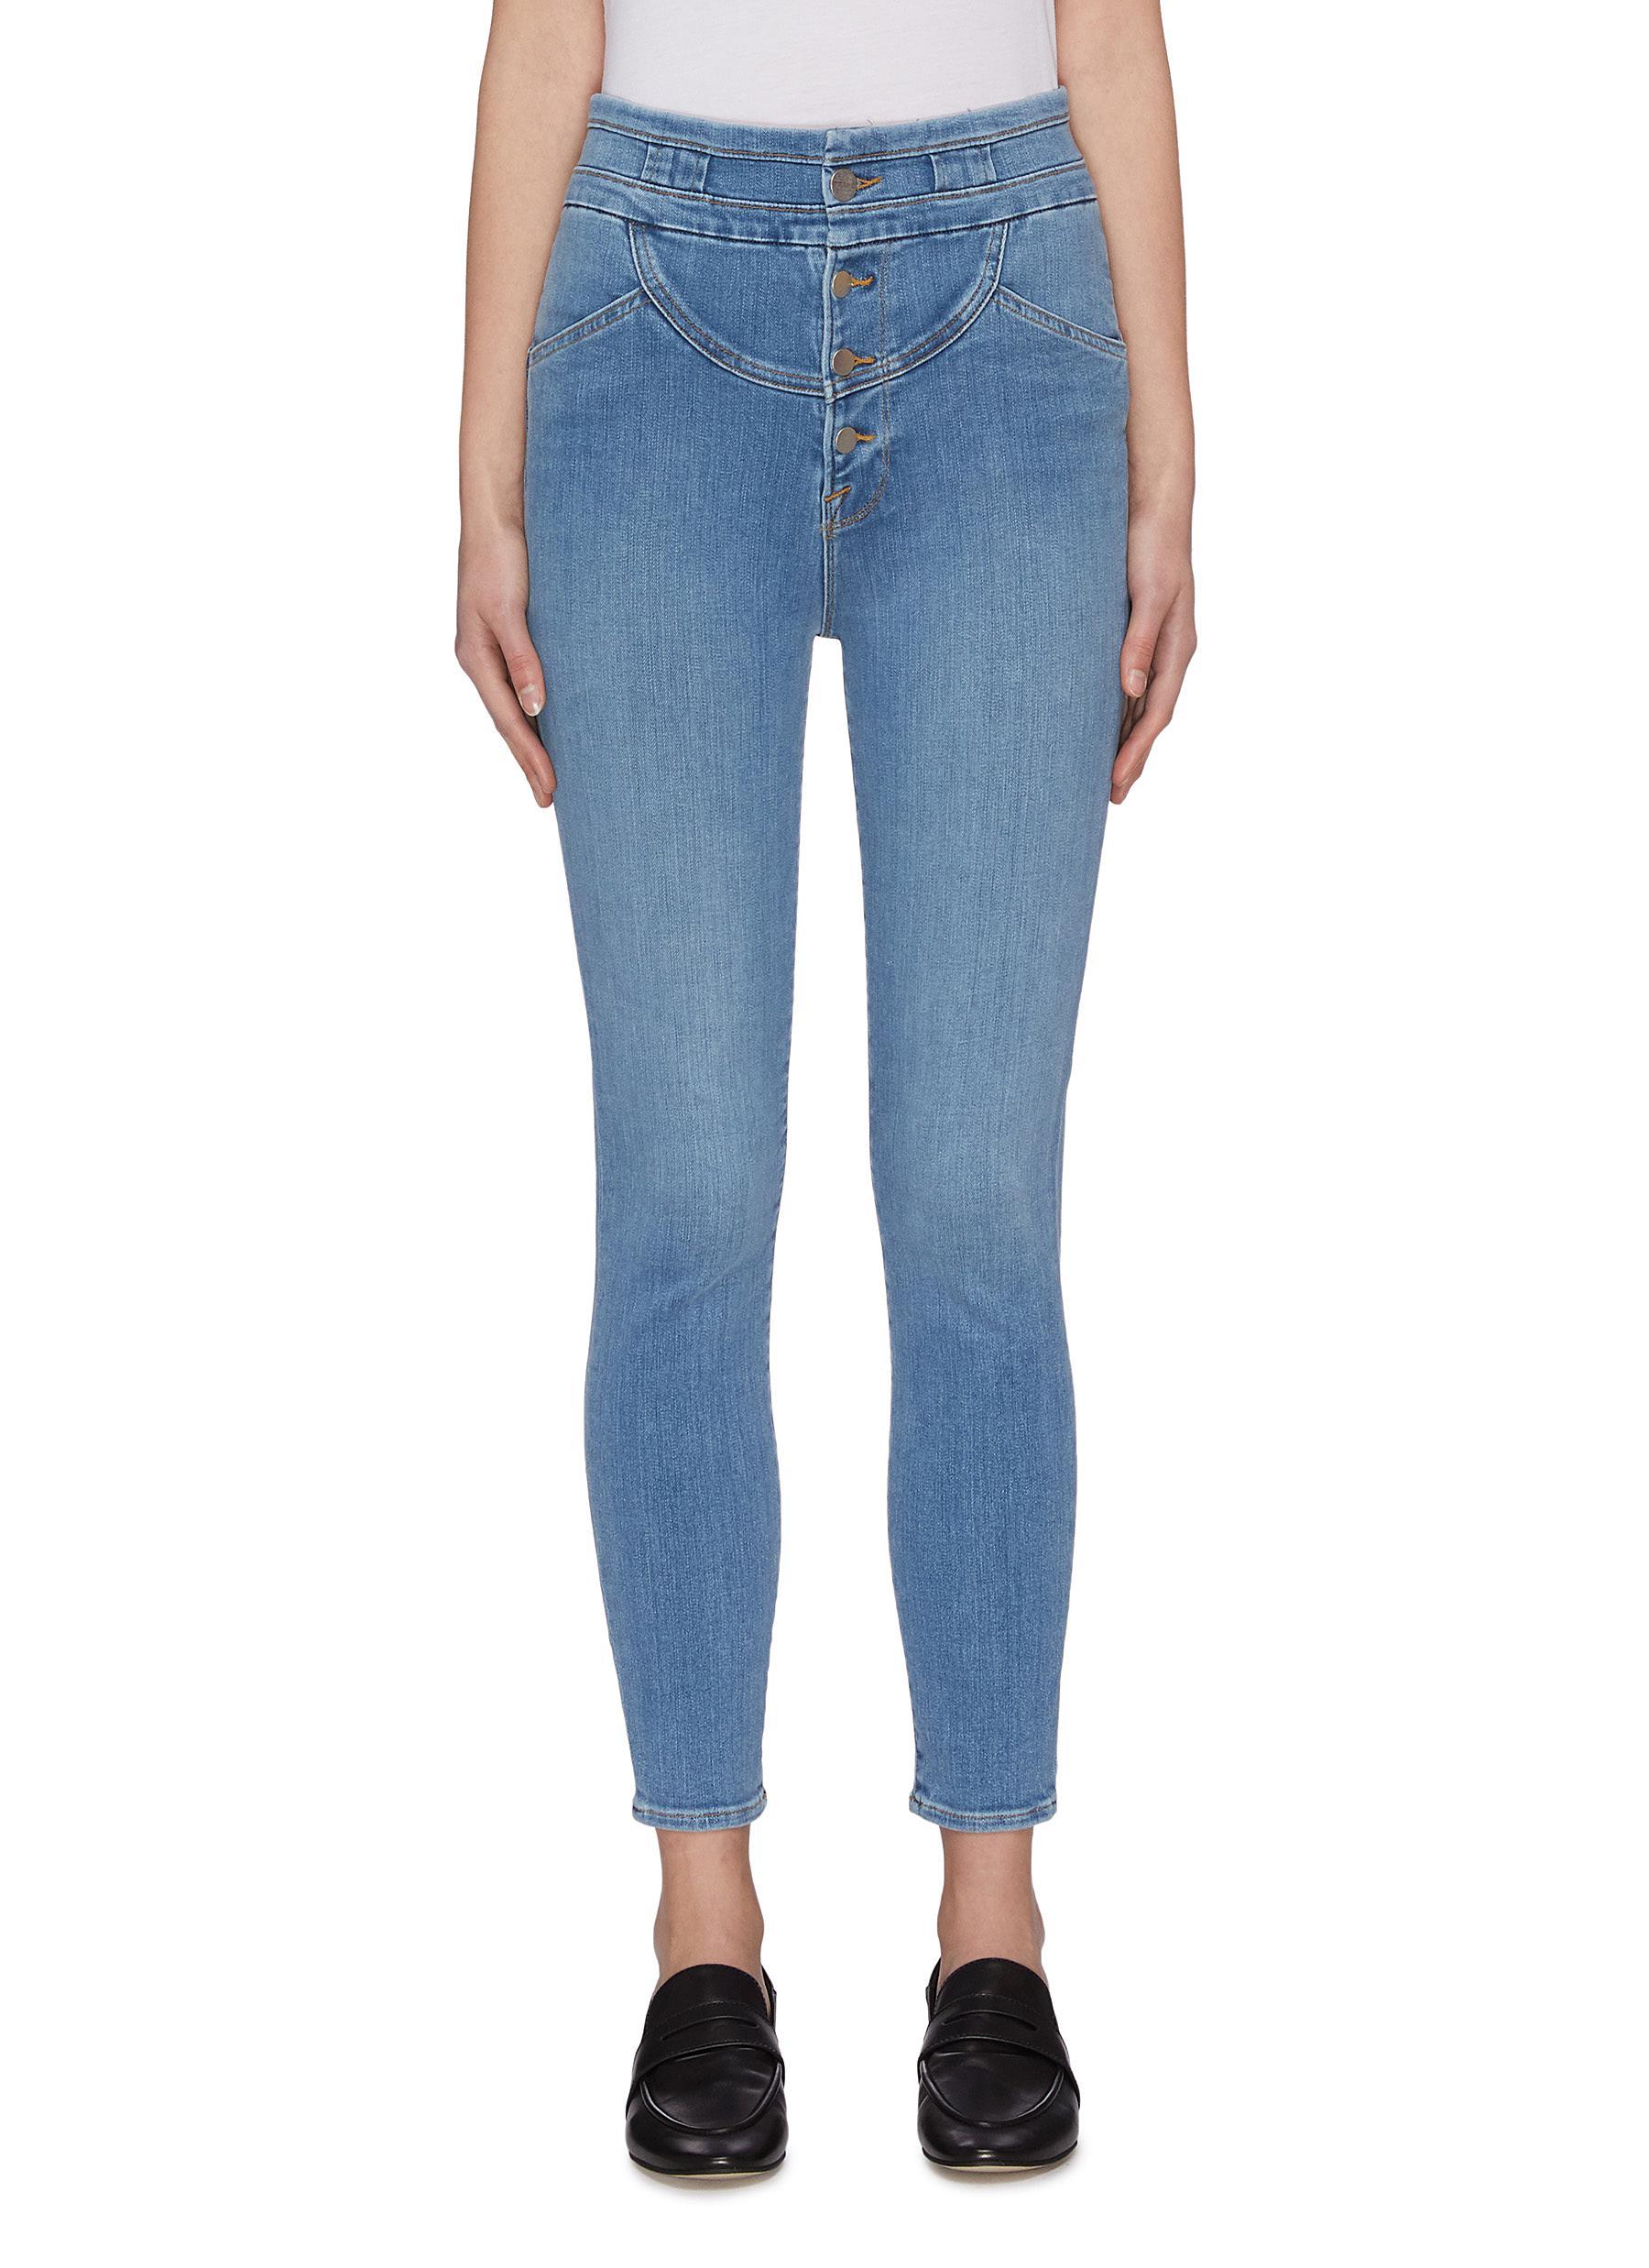 Buy Frame Denim Jeans 'Sunrise' high rise skinny jeans